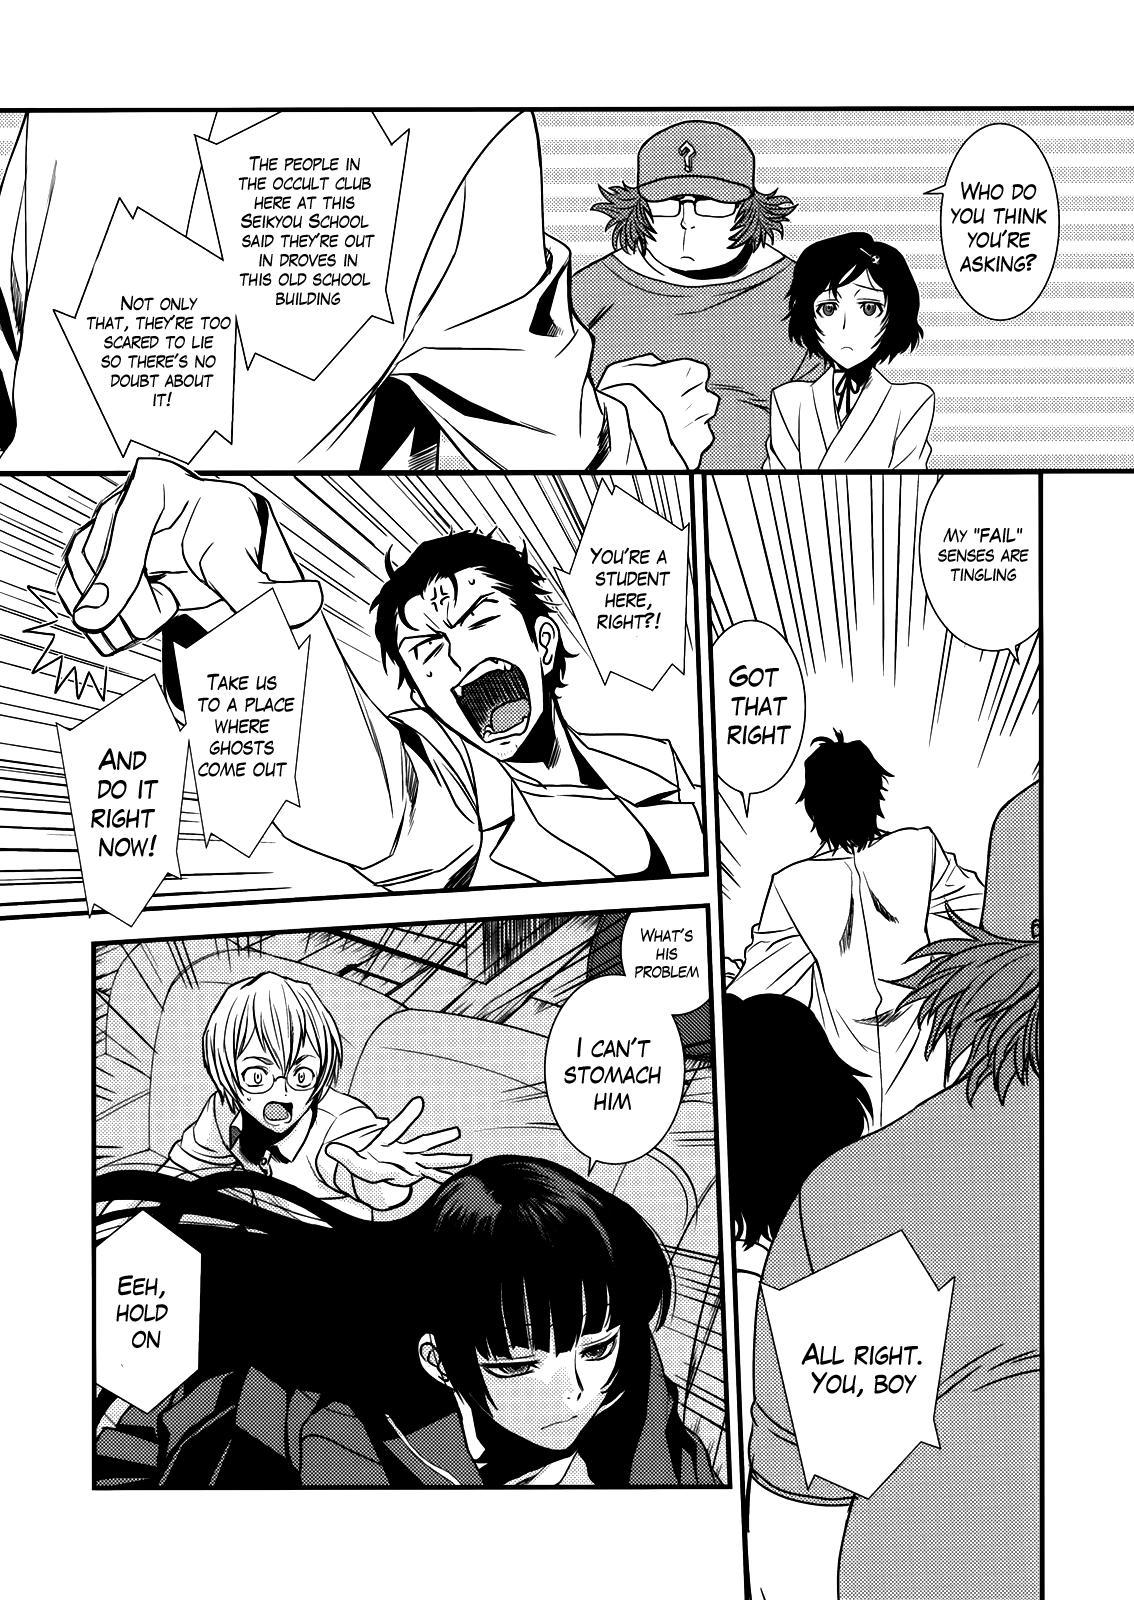 Hontou ni Atta Kowai Hanashi   It Really Was There! A Scary Story 7